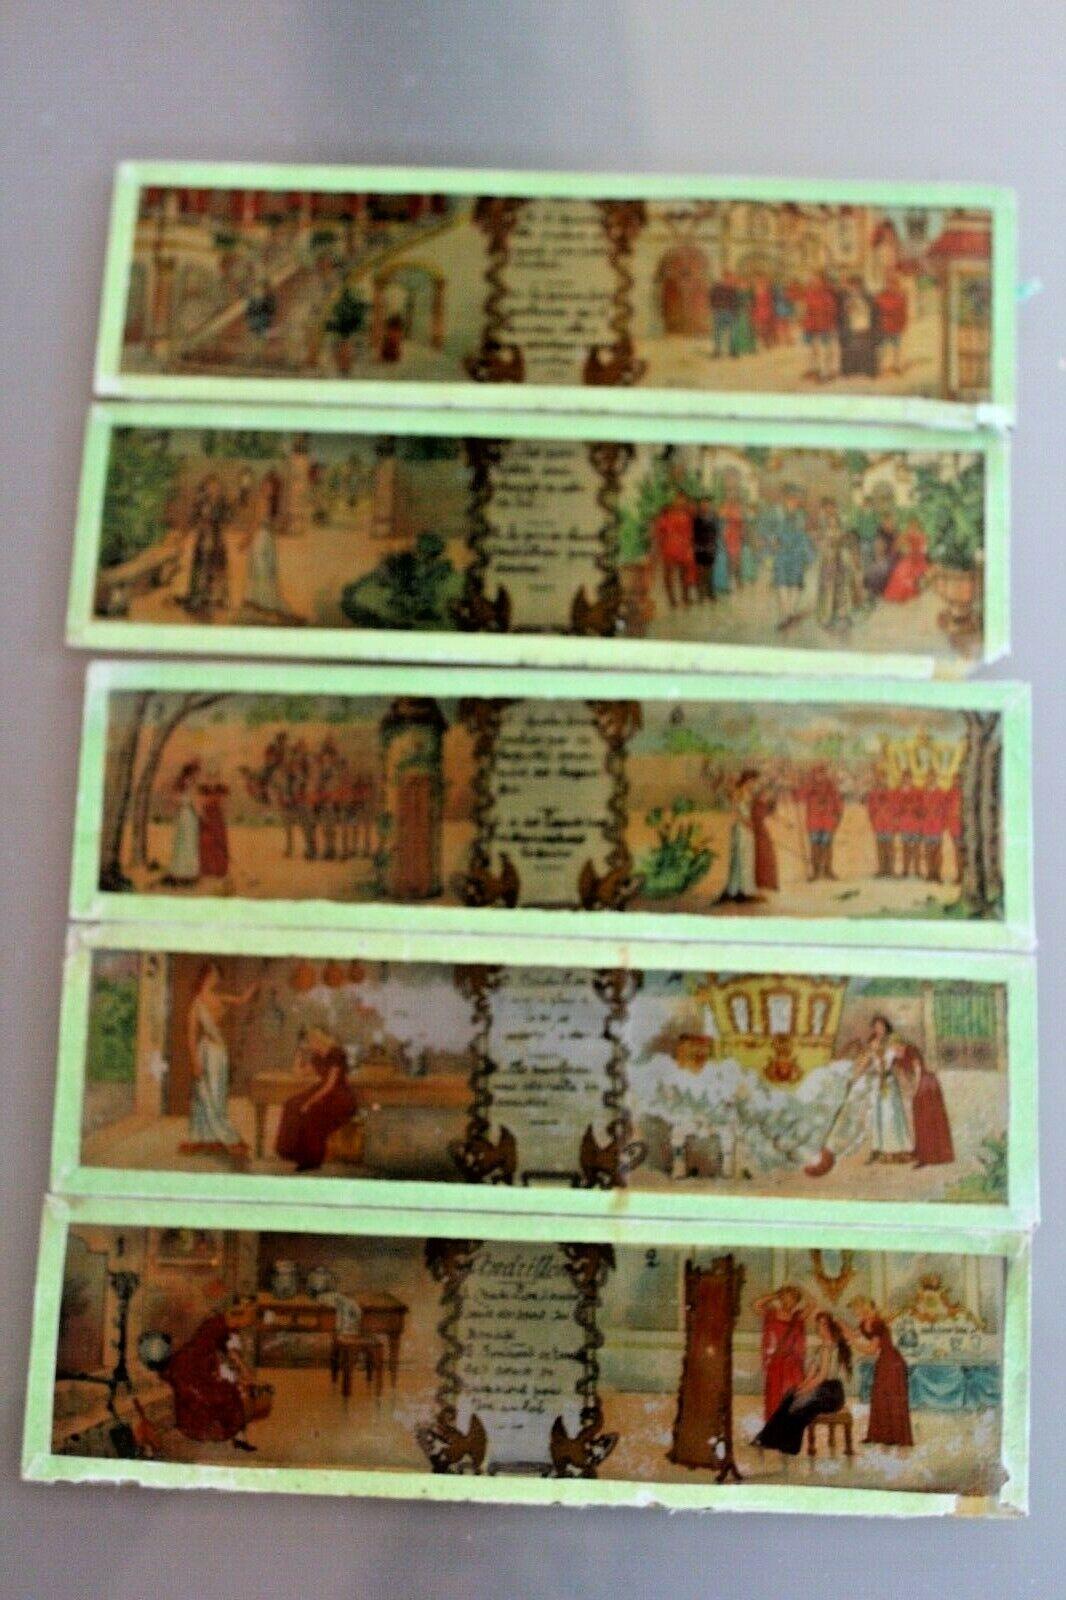 Lote 5 Placas Cristal para Farolillo Mágica  Cenicienta  1900